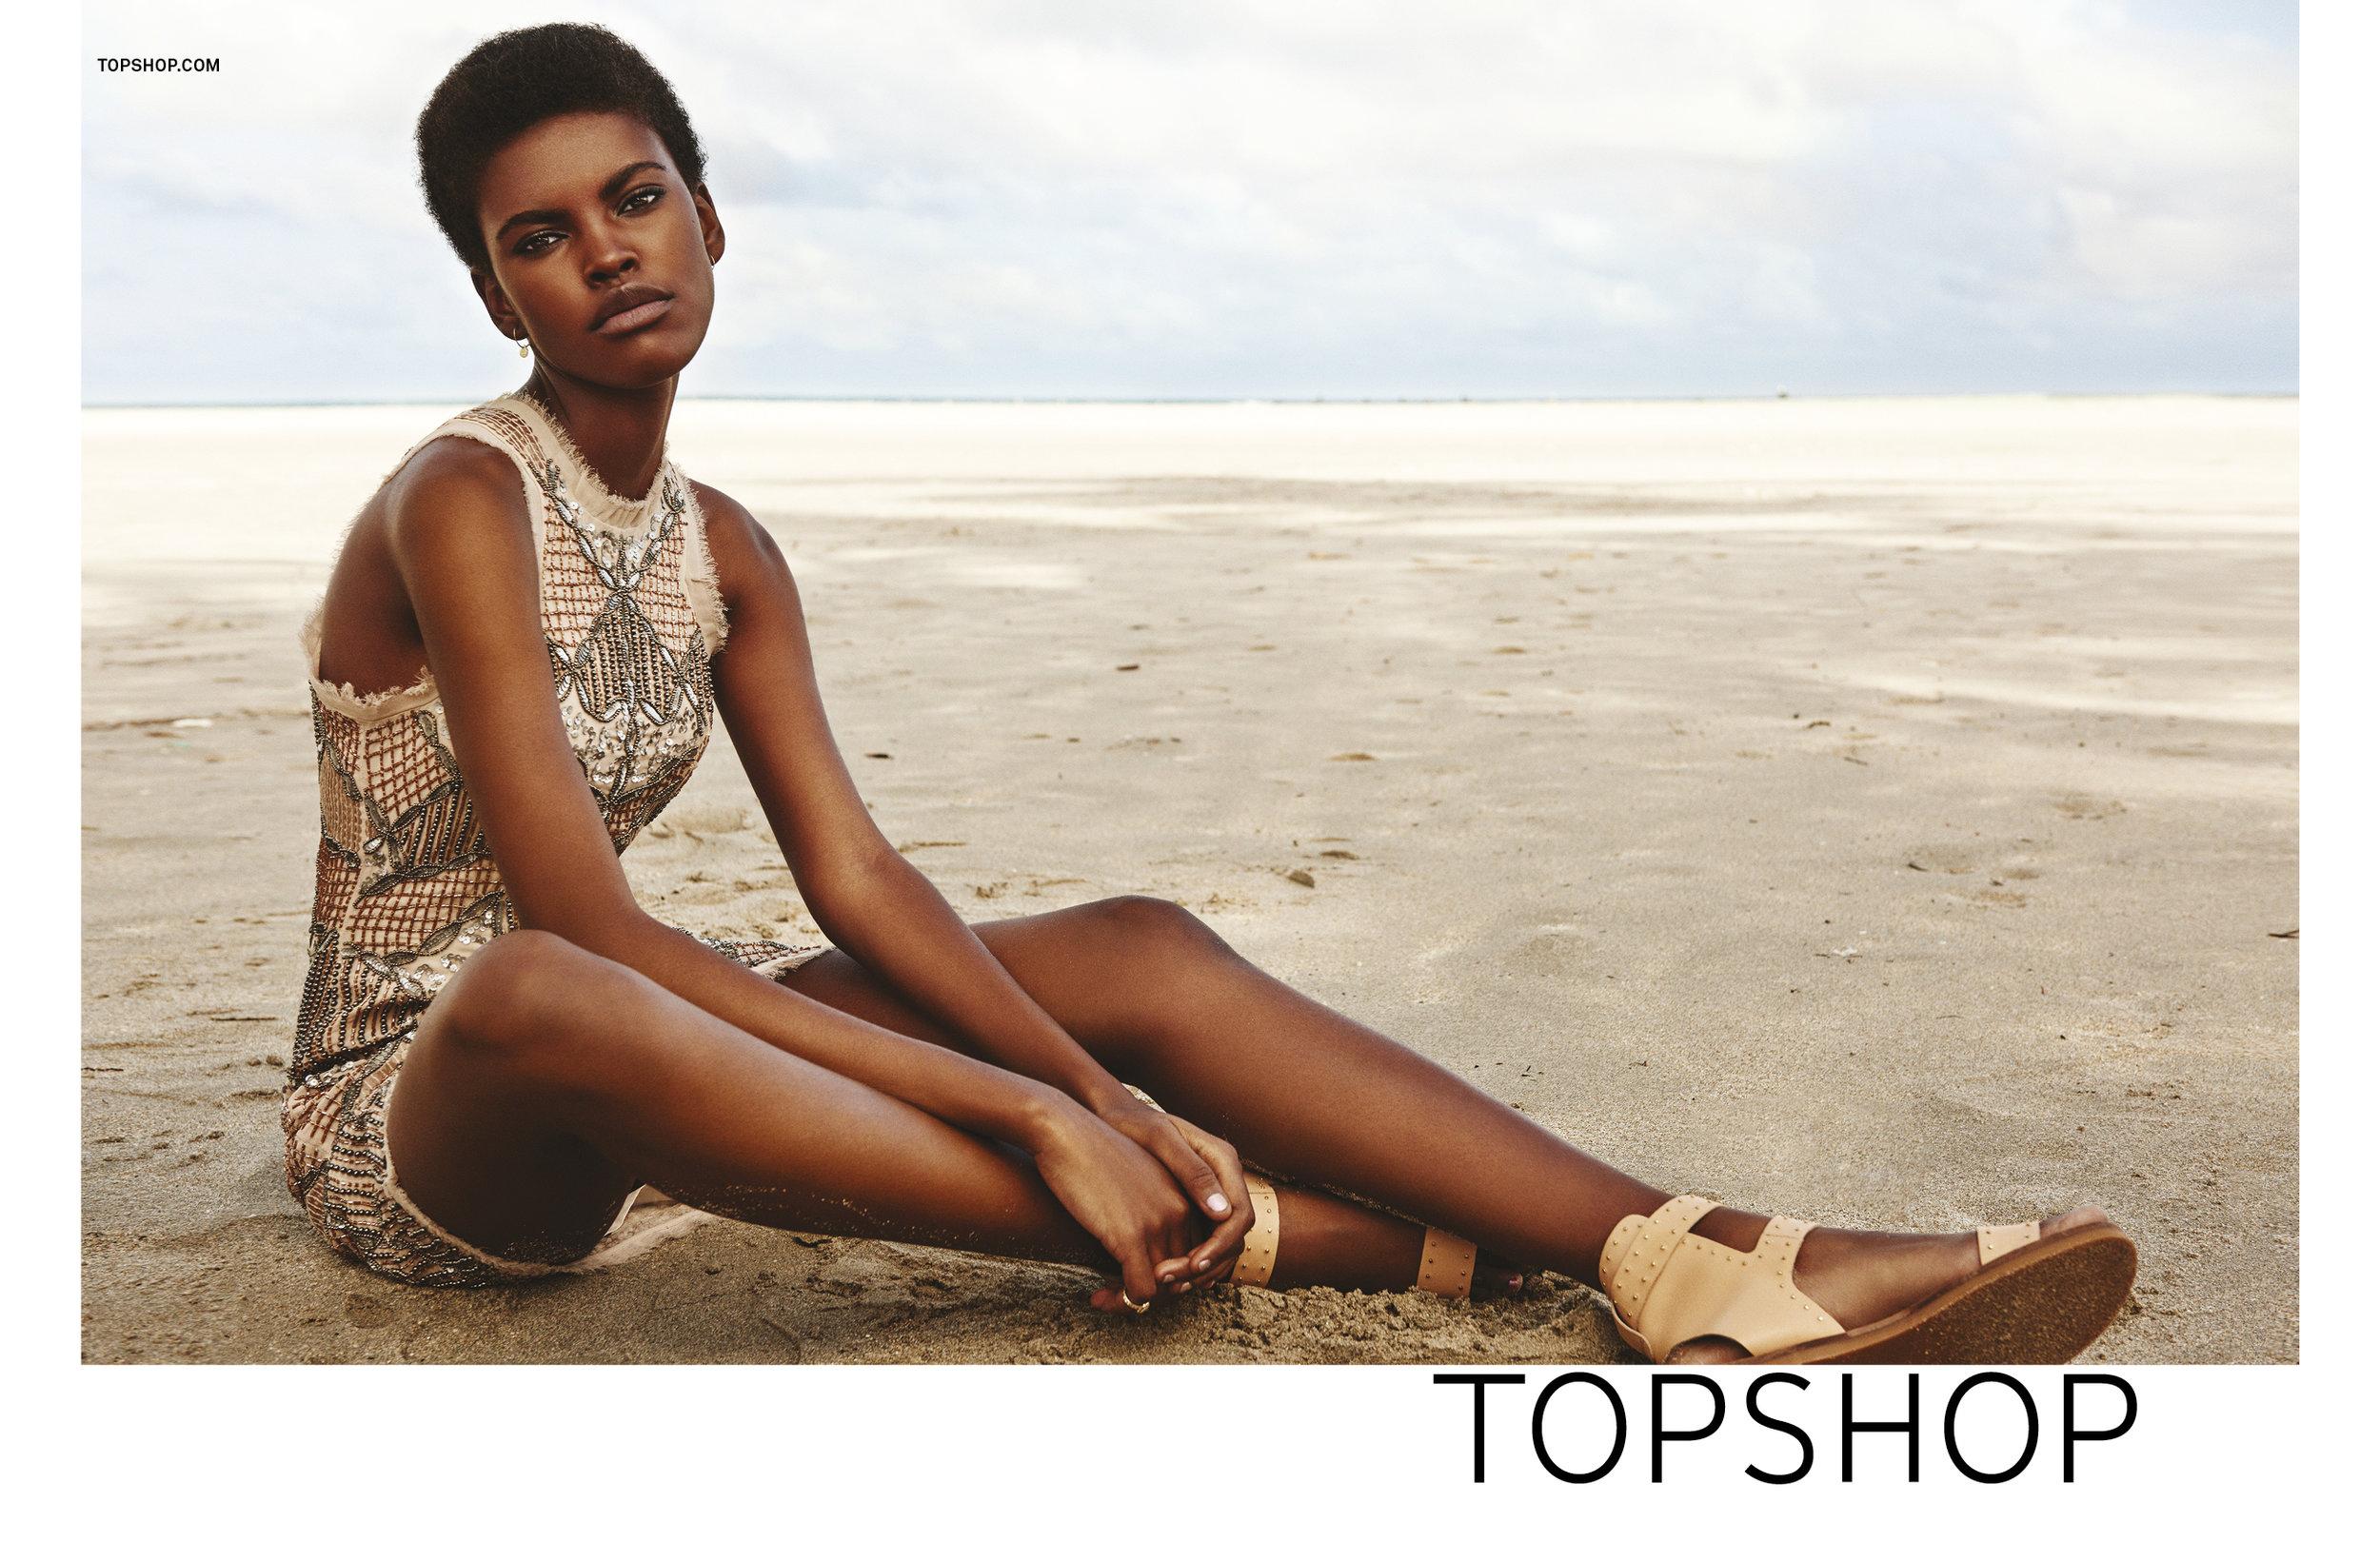 Top shop campaign 2.jpg